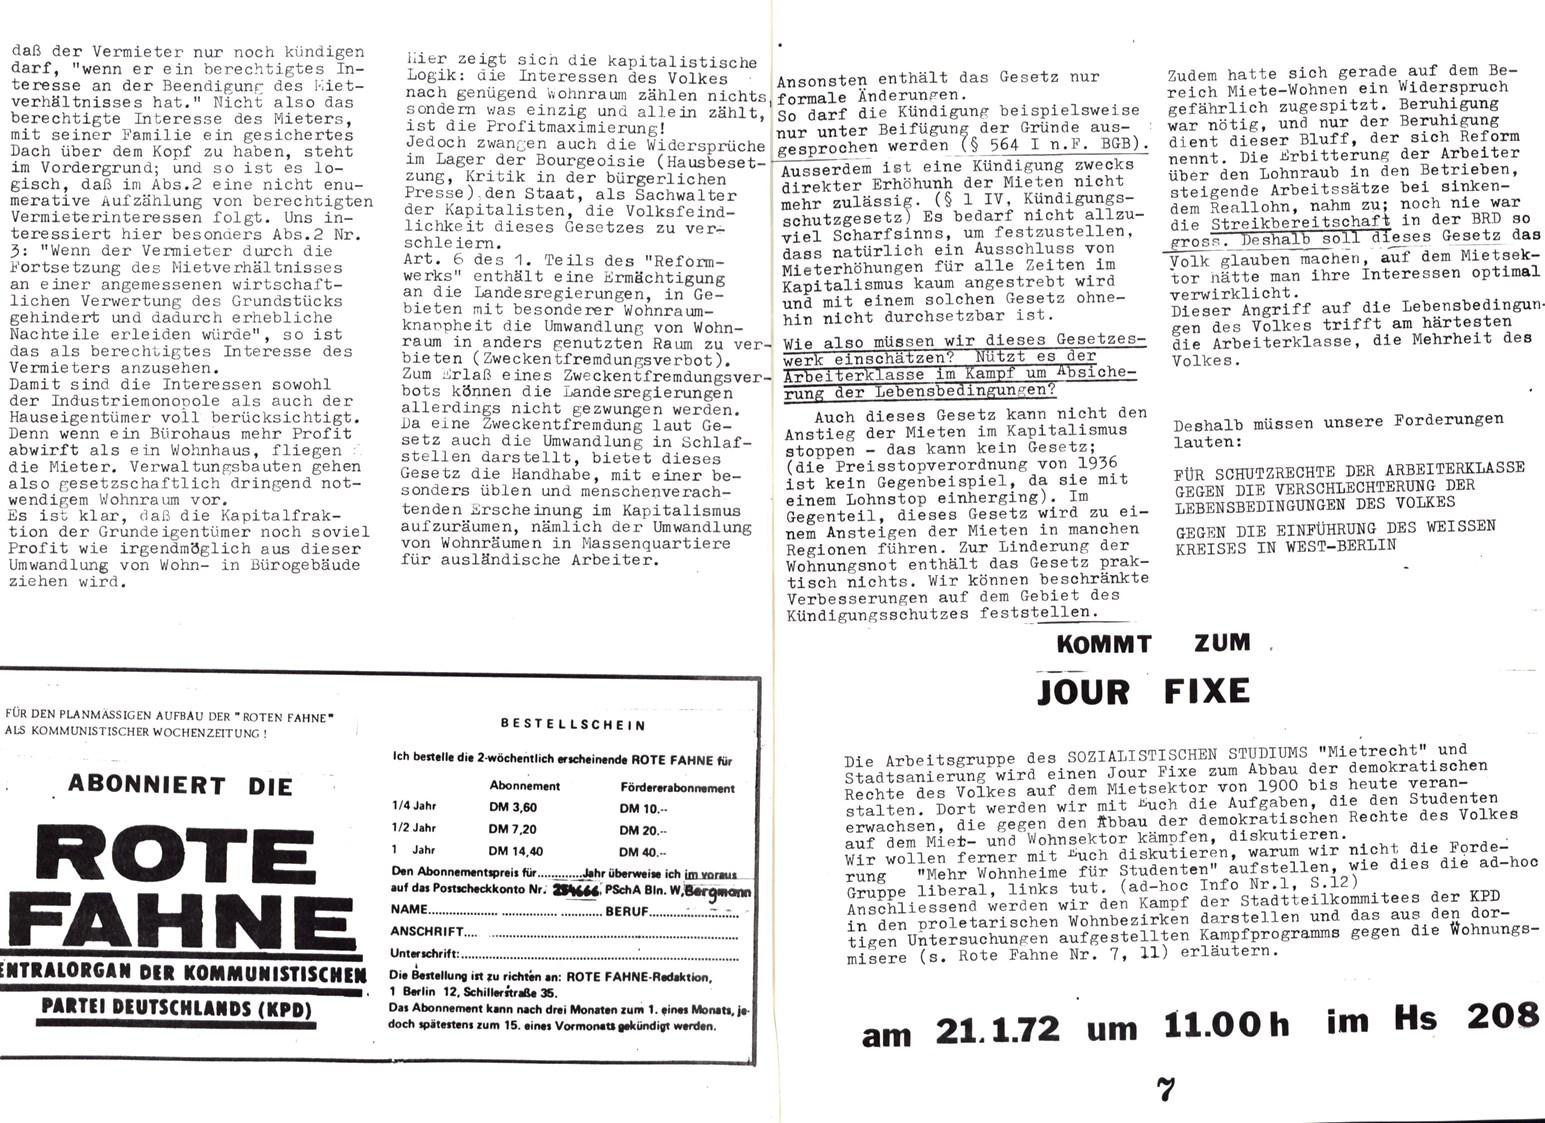 Berlin_KSV_Jura_Studentenpresse_19720115_06_04